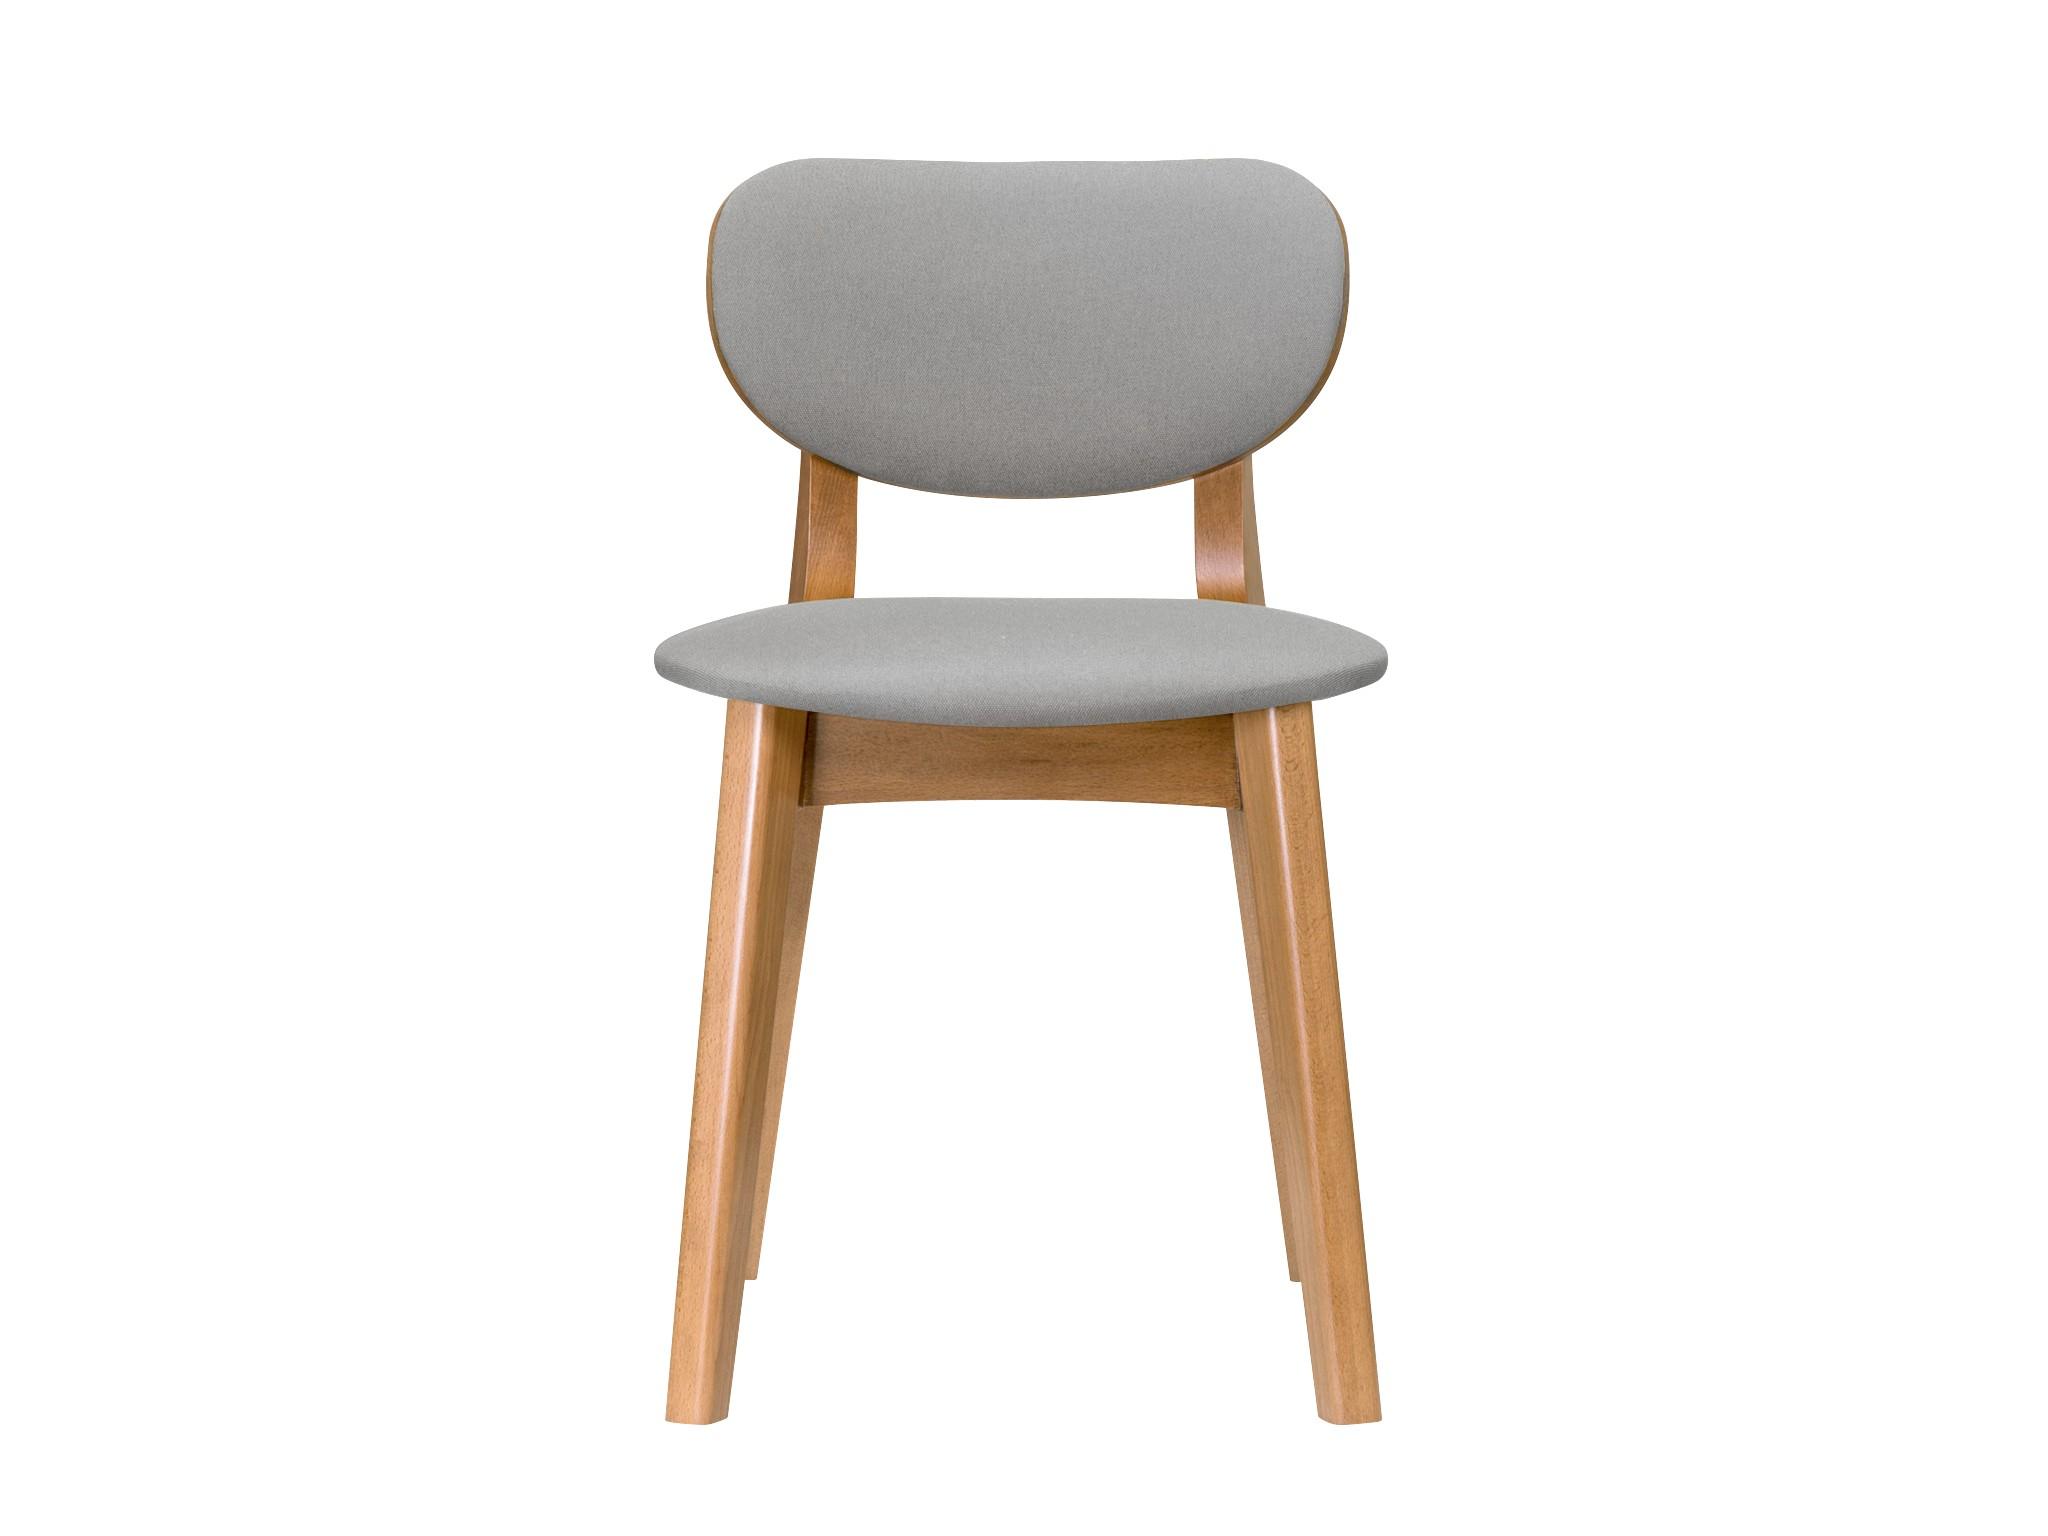 Кухонный стул MyFurnish 15433112 от thefurnish